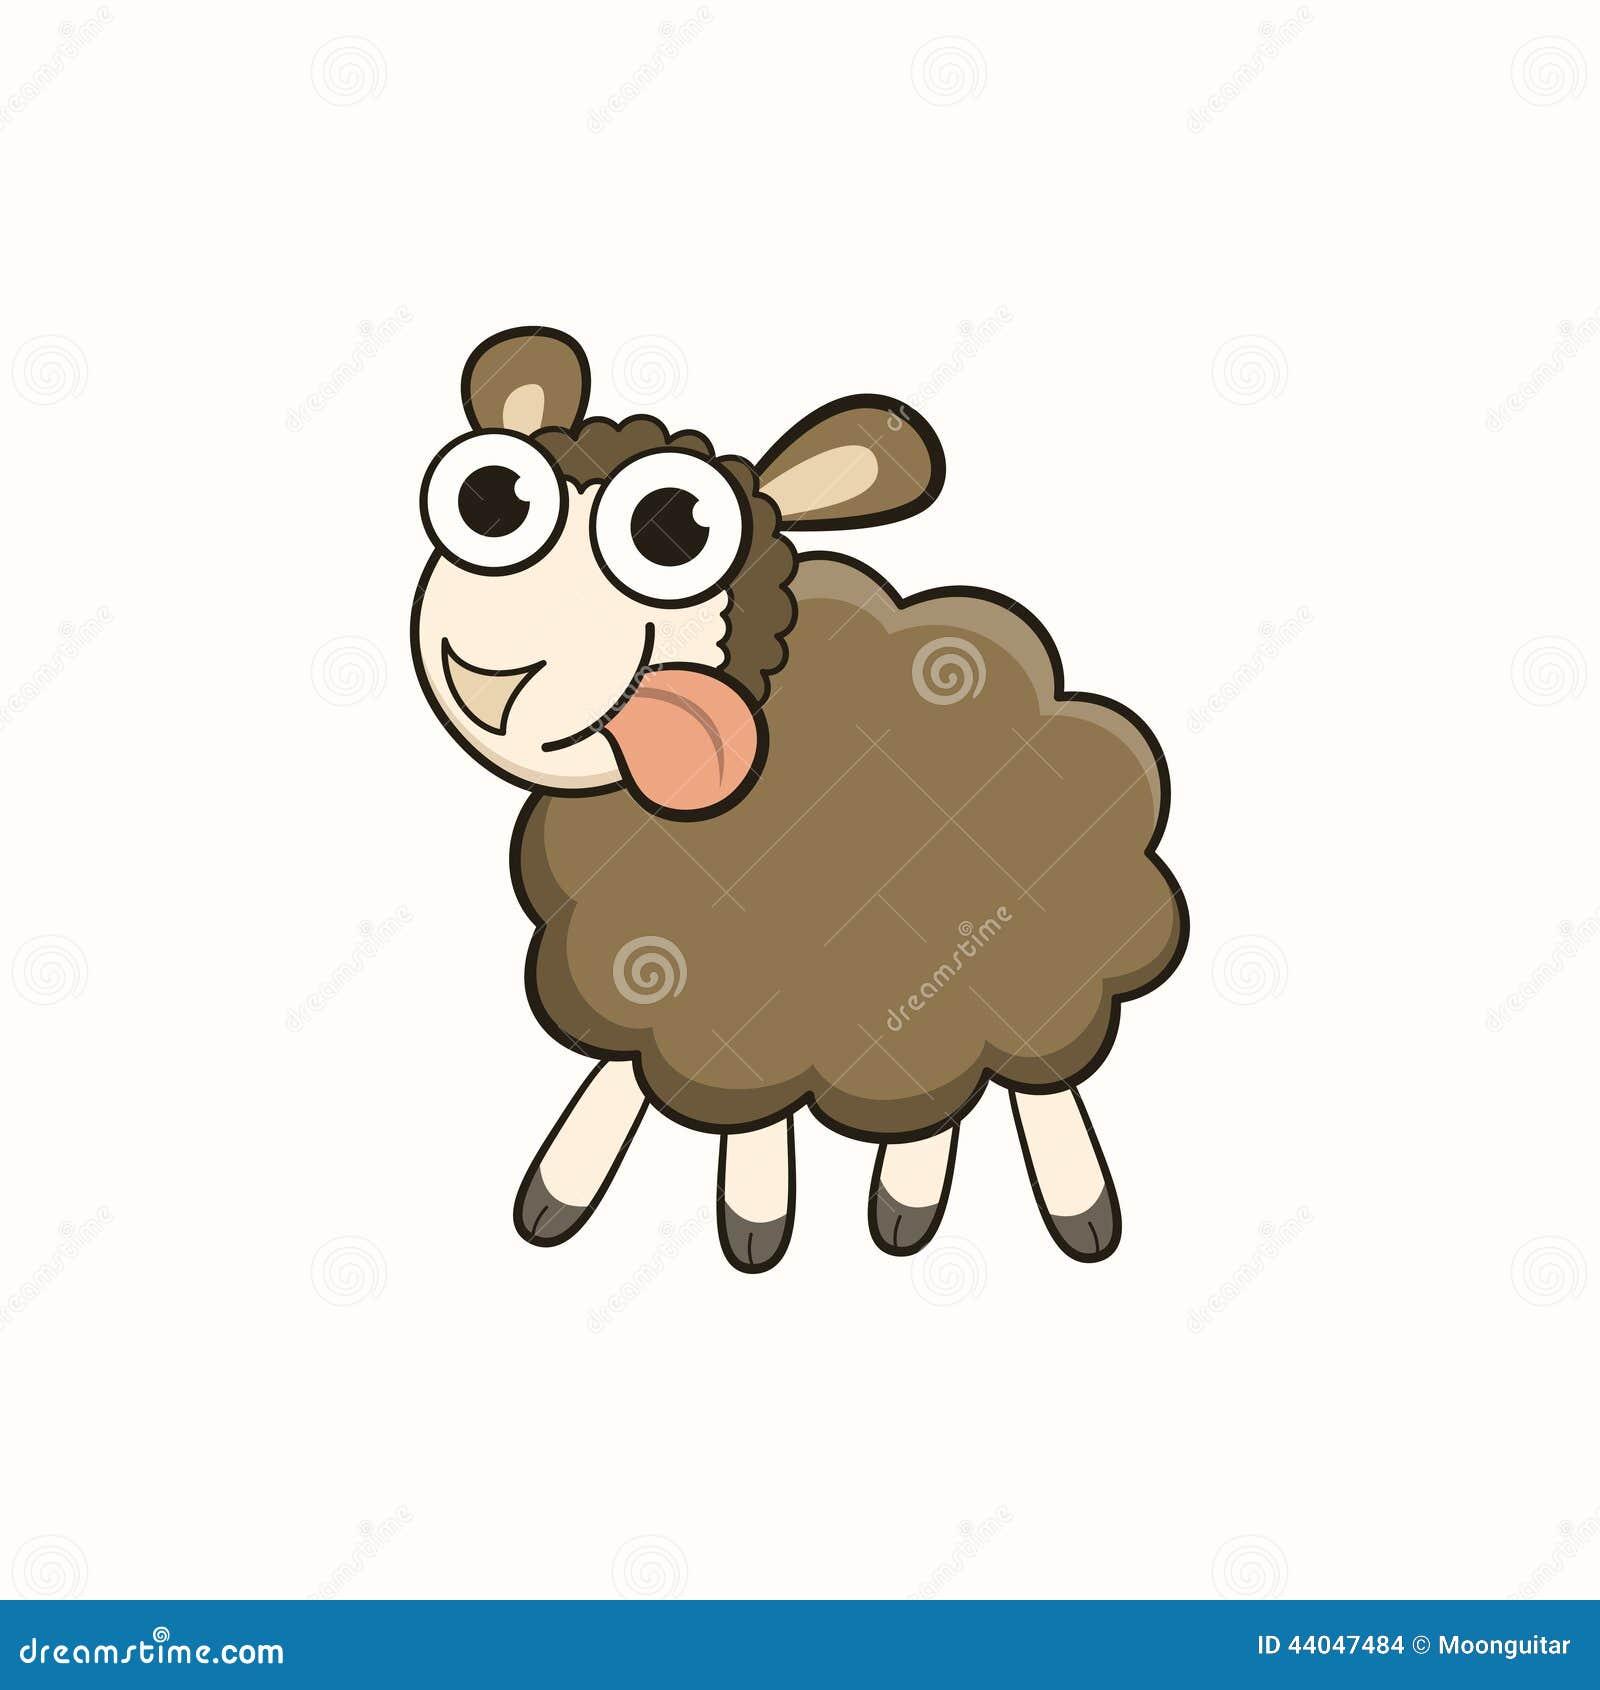 ... Sheep, Character For Christmas And New Stock Vector - Image: 44047484